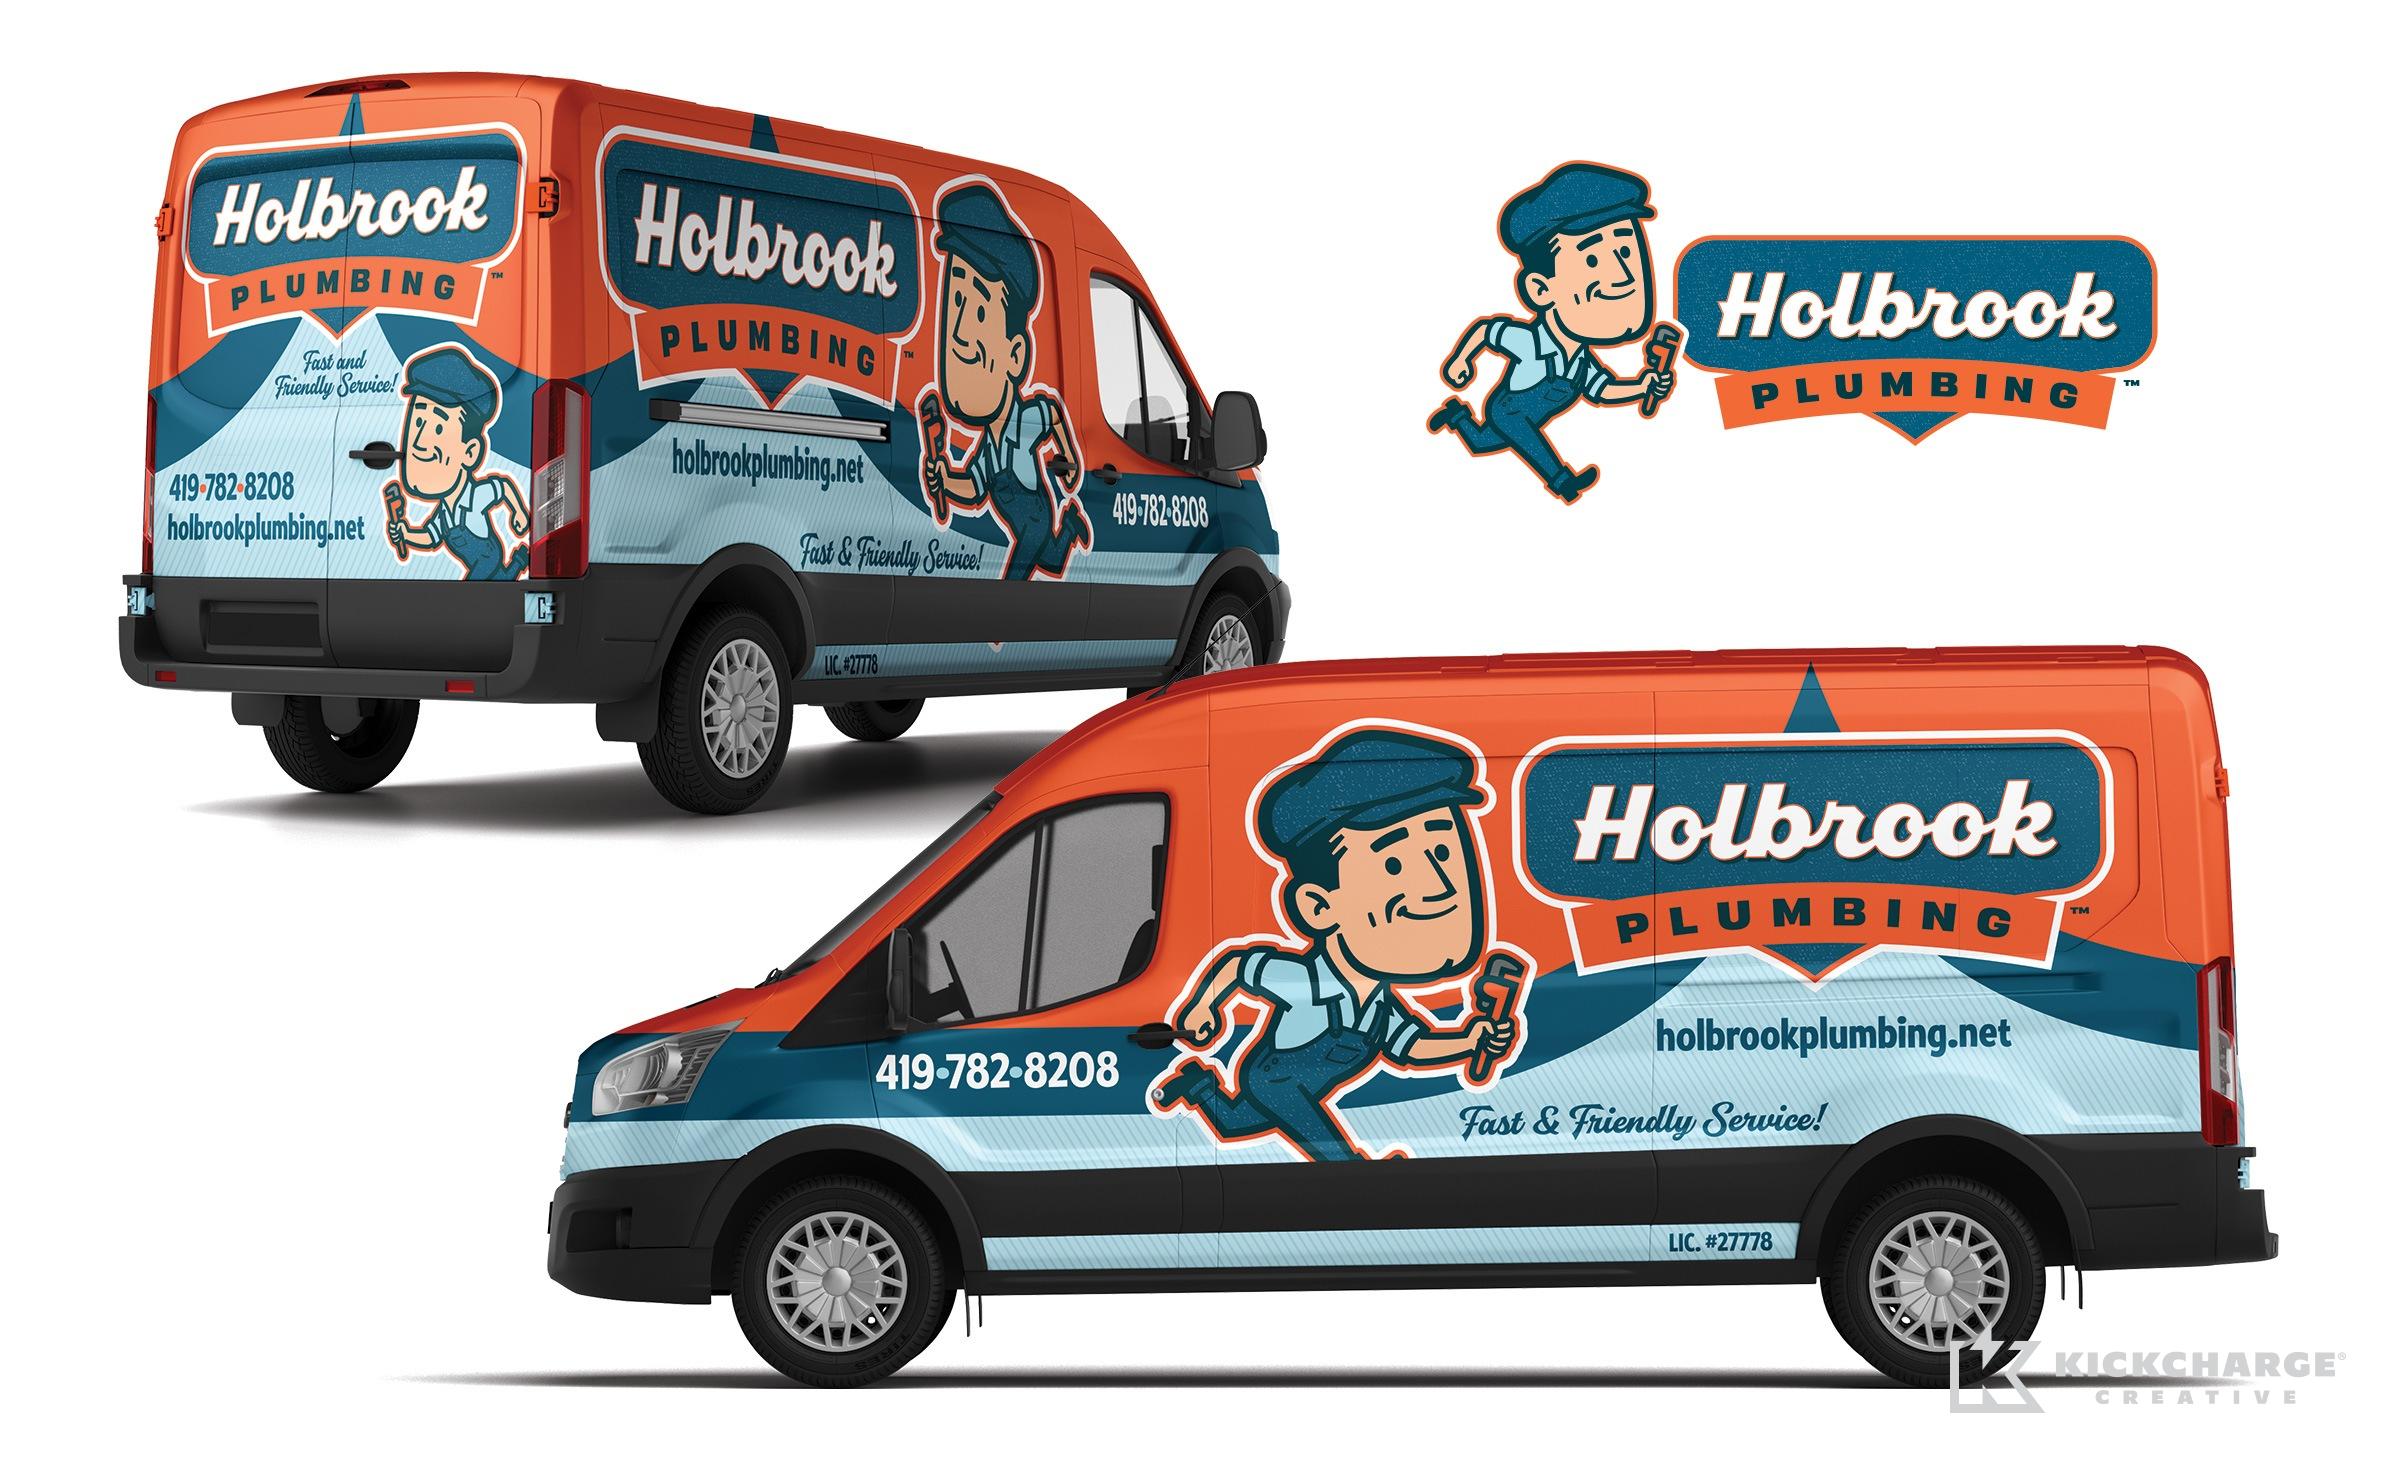 plumbing truck wrap for Holbrook Plumbing